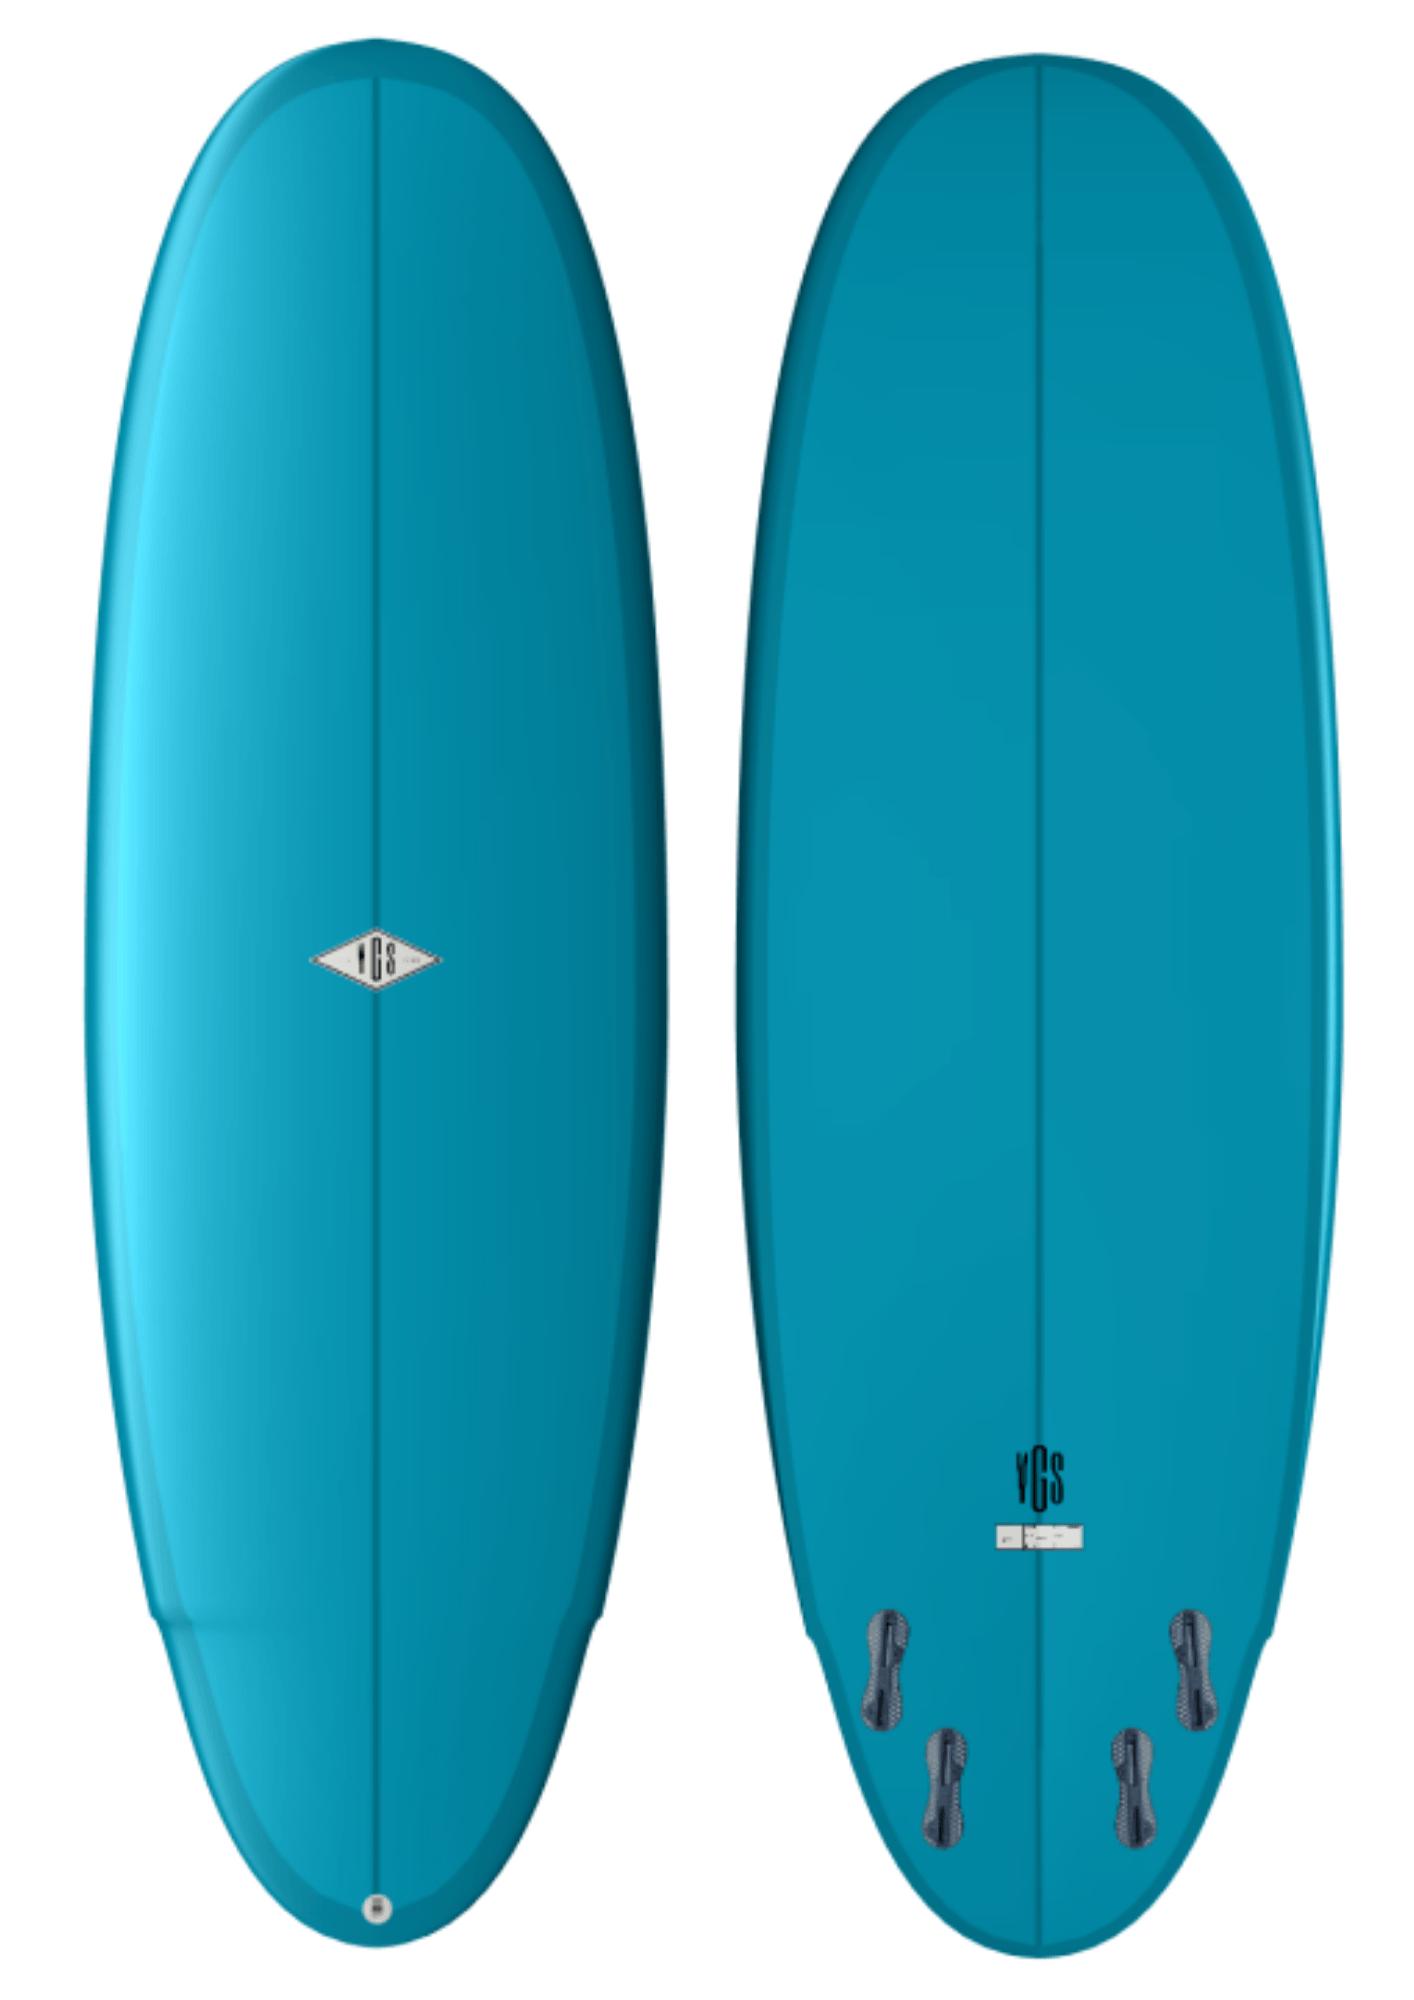 Modelo Bonete | Vgs Custom Boards